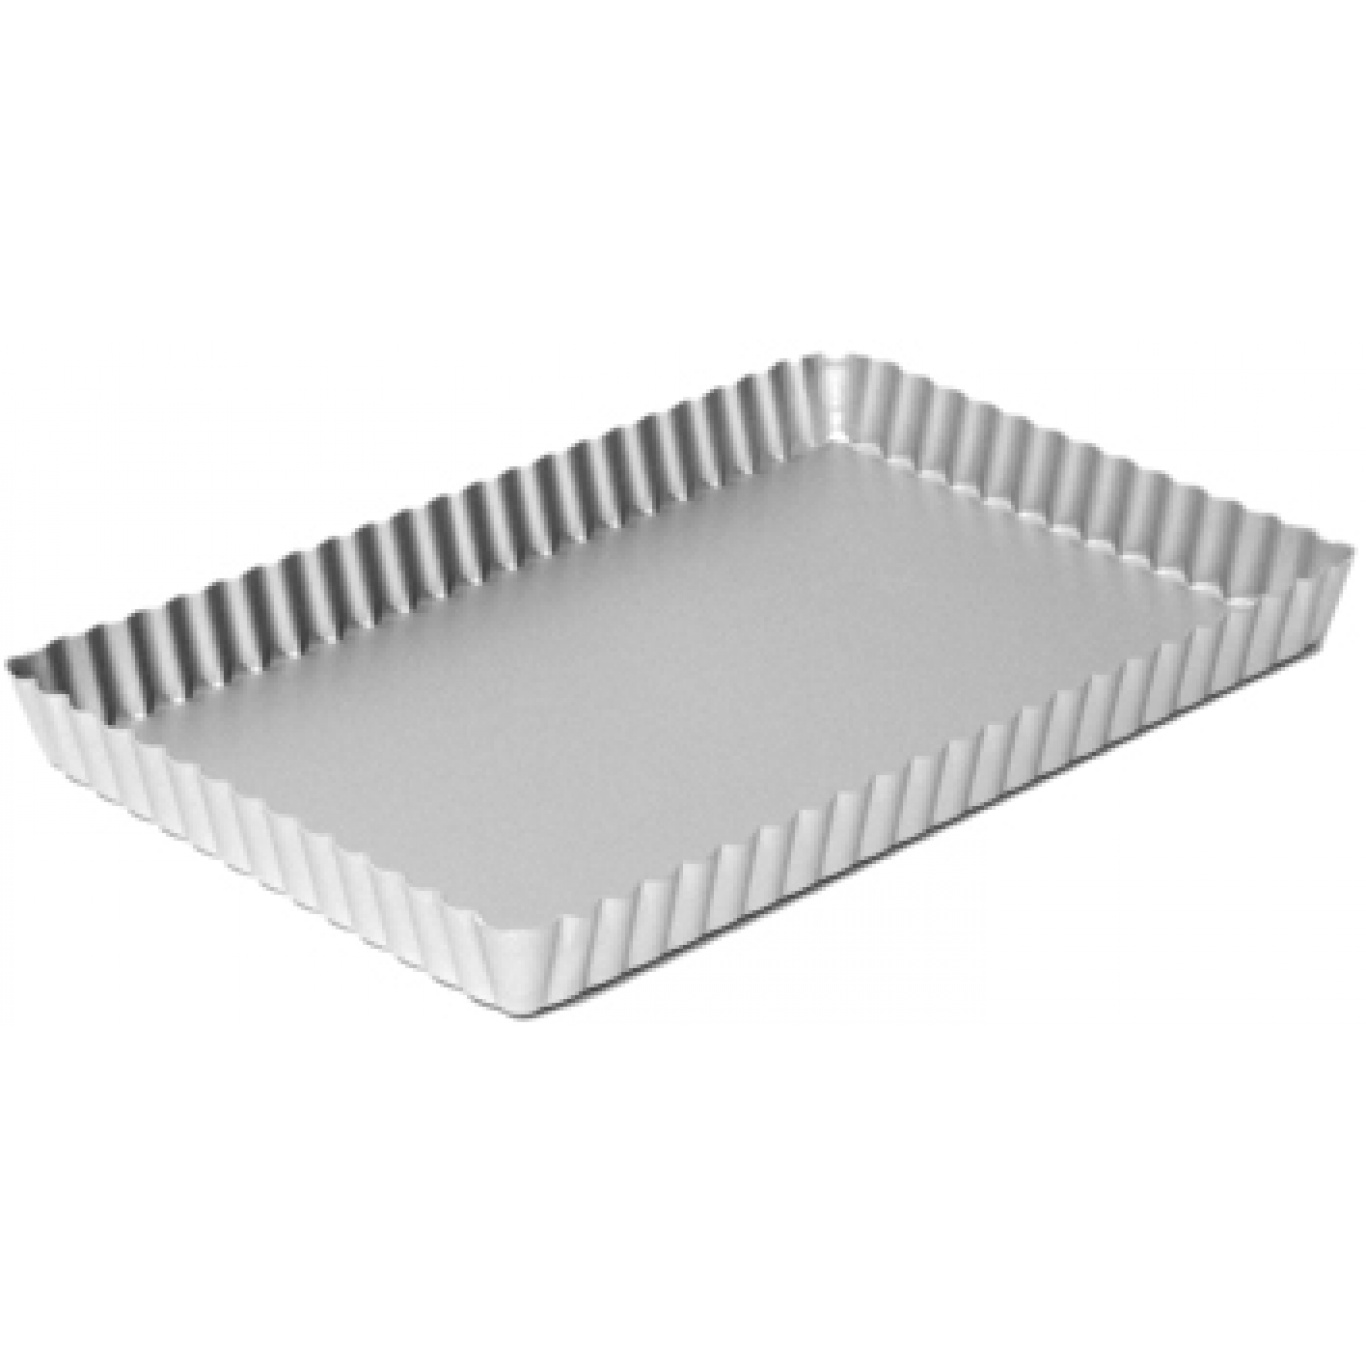 Image of Silverwood Quiche Provencale Loose Base 12 x 8ins/30 x 20cm